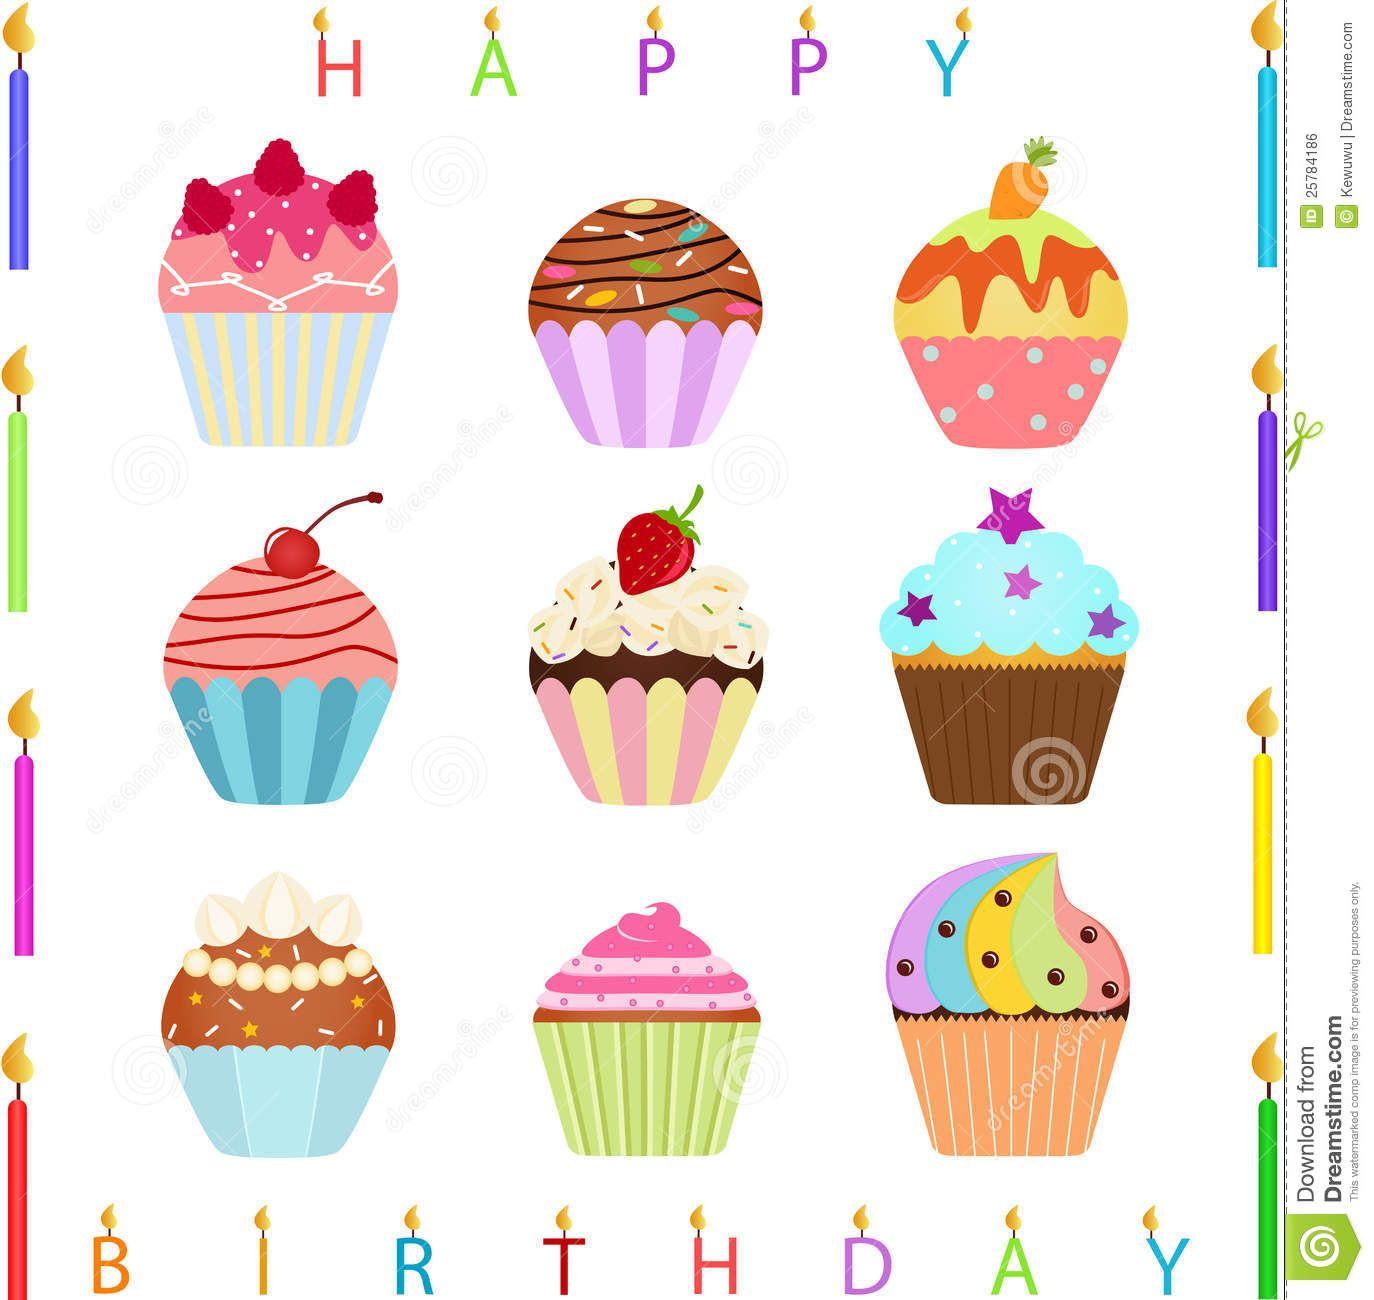 Cute Cupcake With Happy Birthday Candles We Love Birthdays